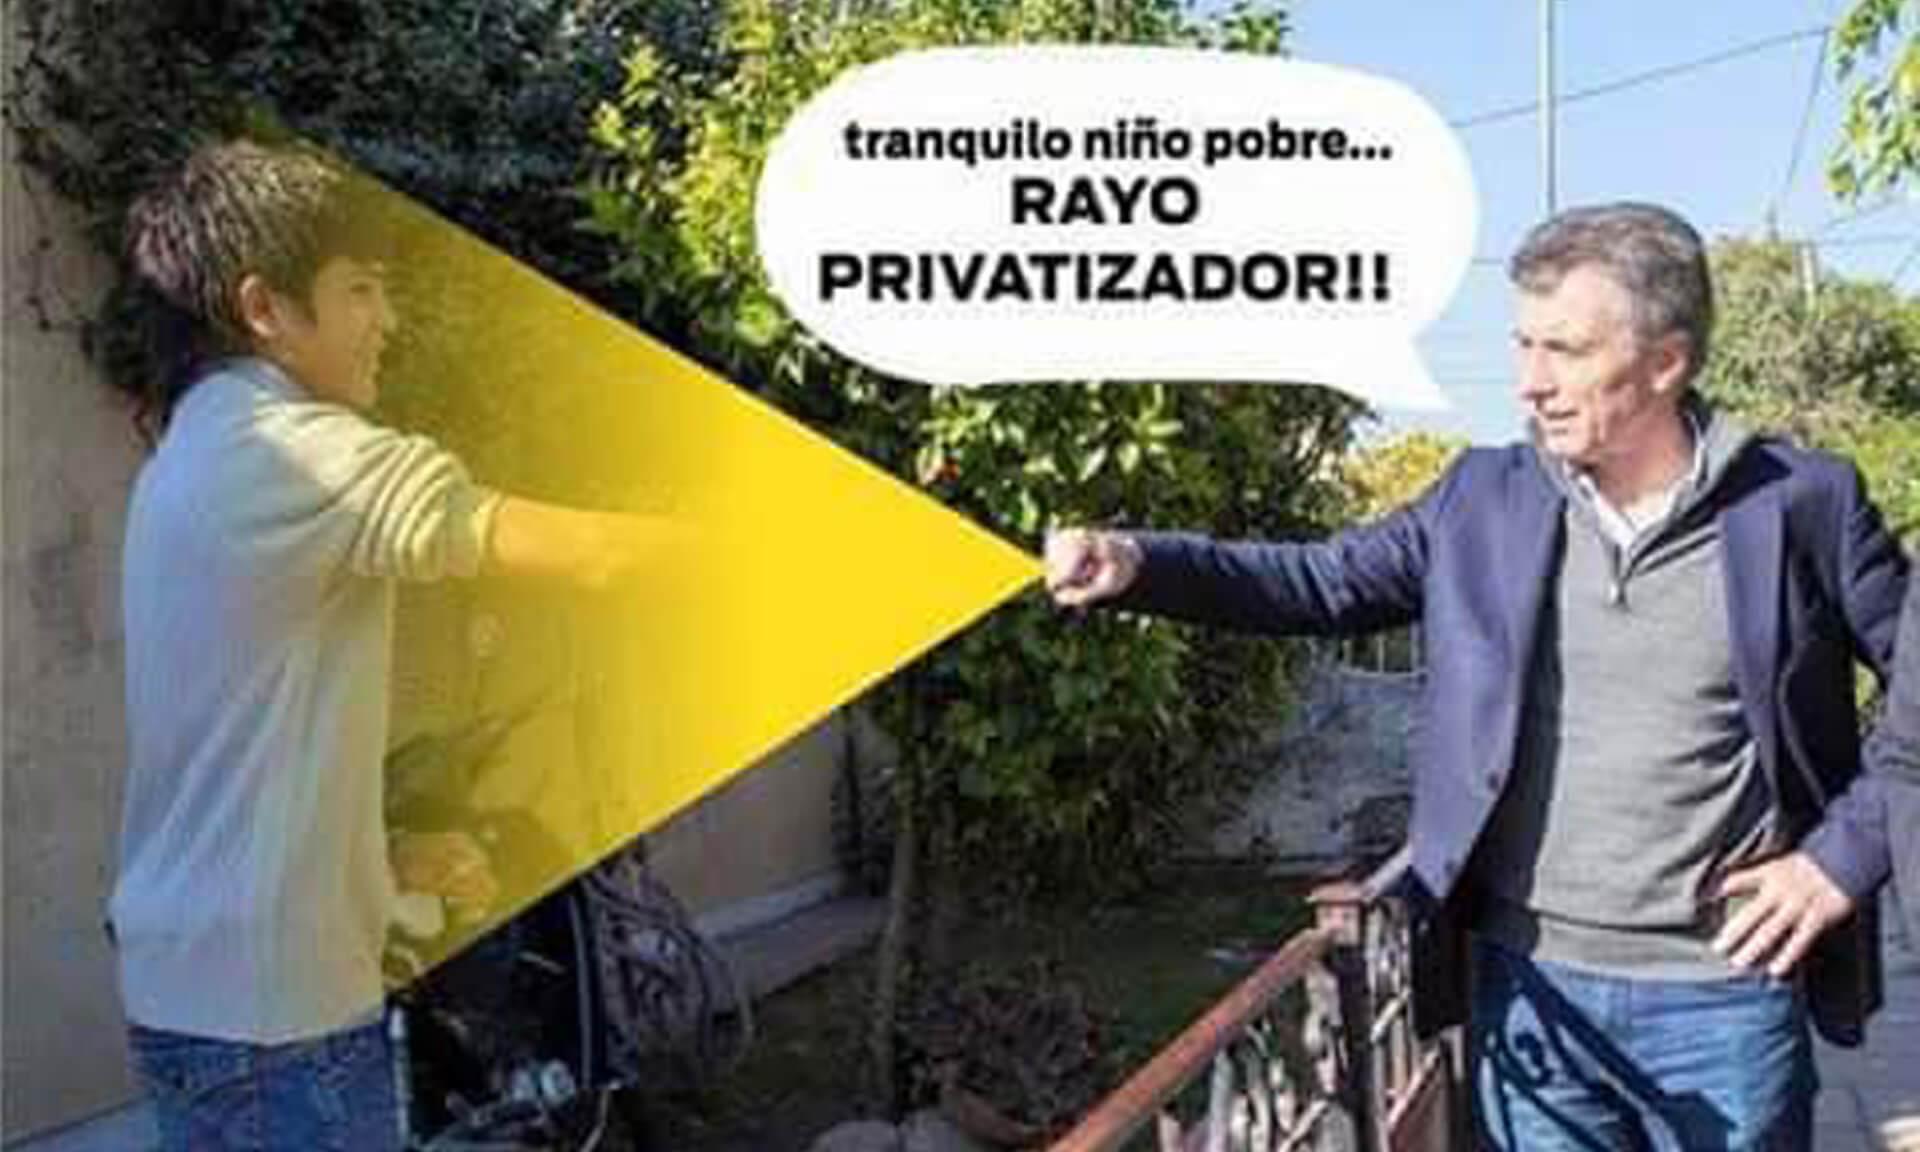 macri-memes-rayo-privatizacion